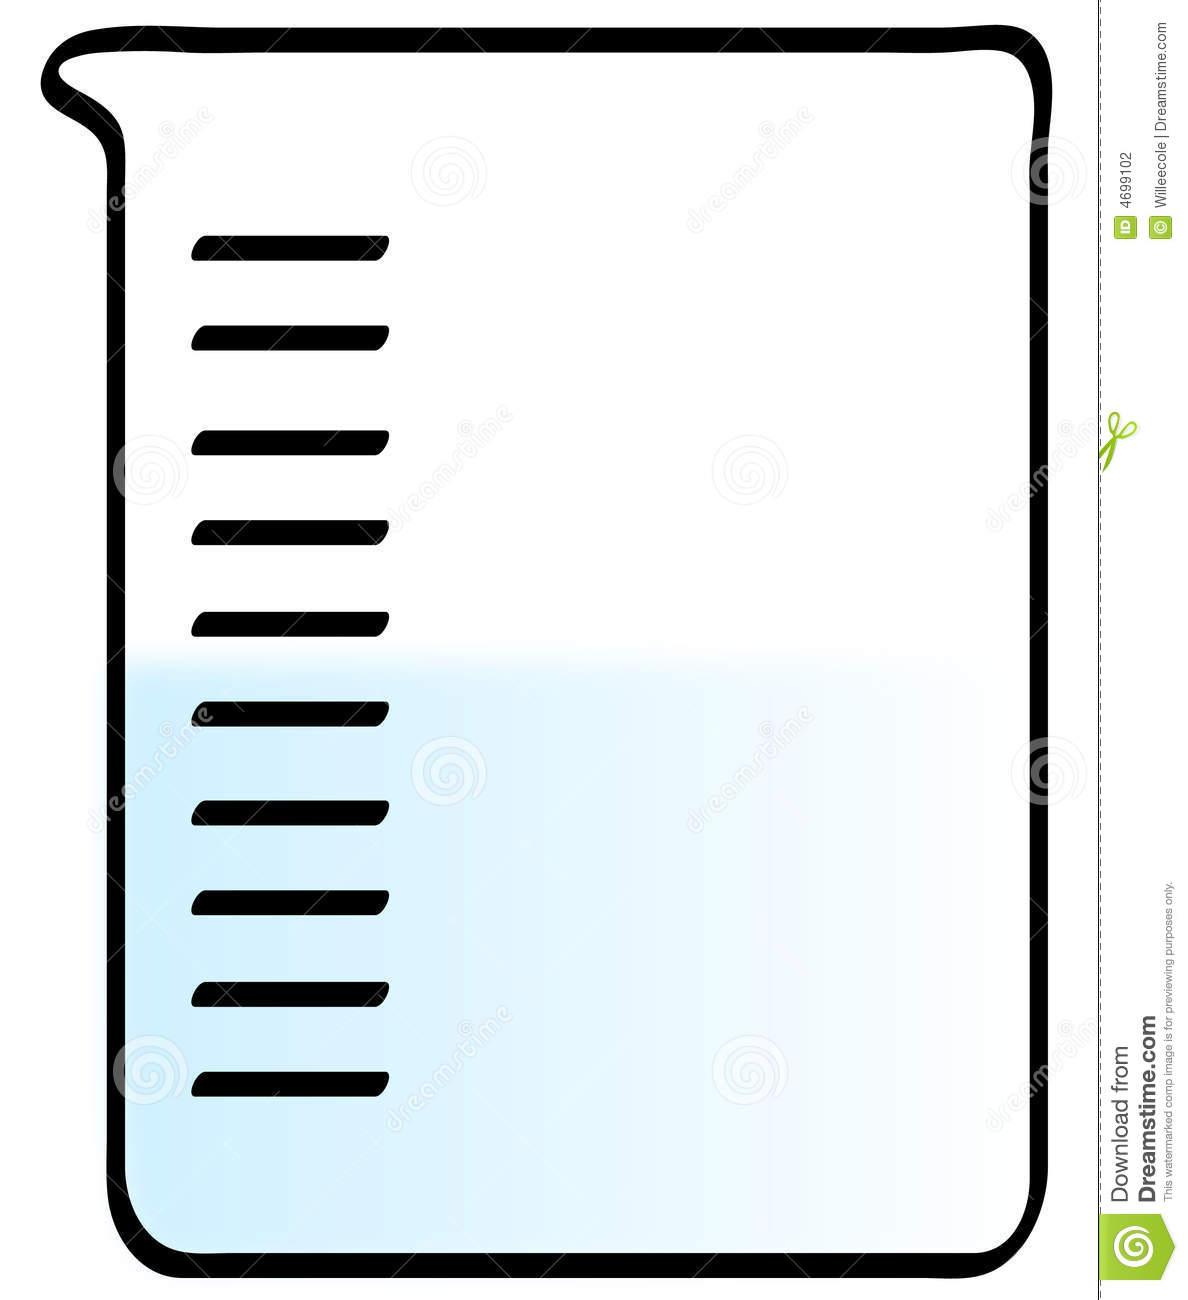 1188x1300 Beaker Of Water Clipart